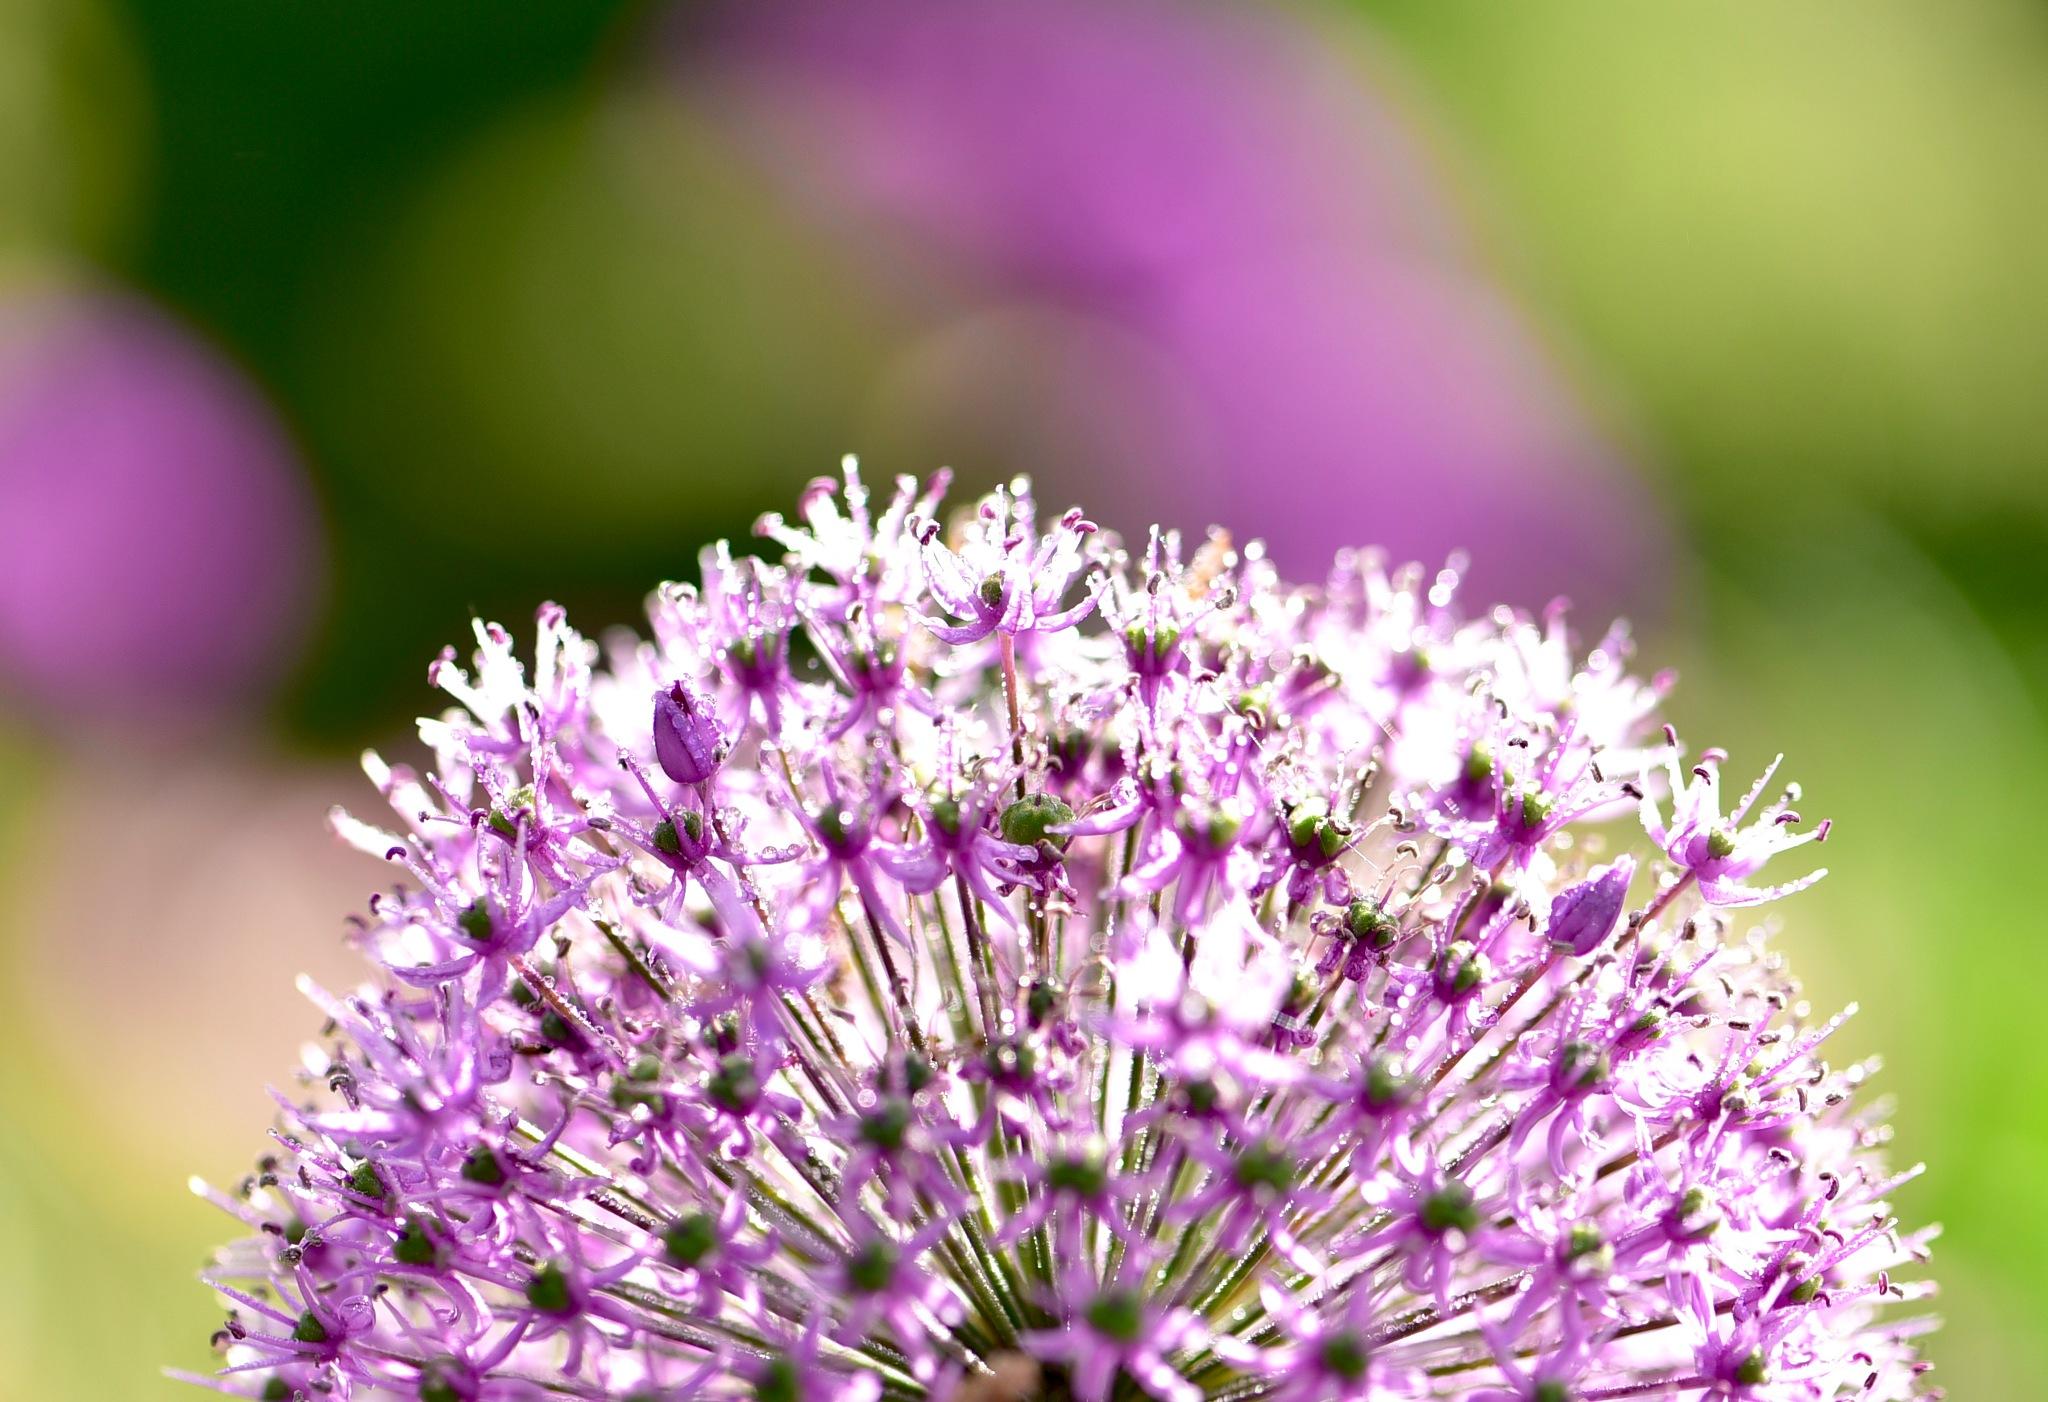 Macro flowers 400! by Memed Bayatli